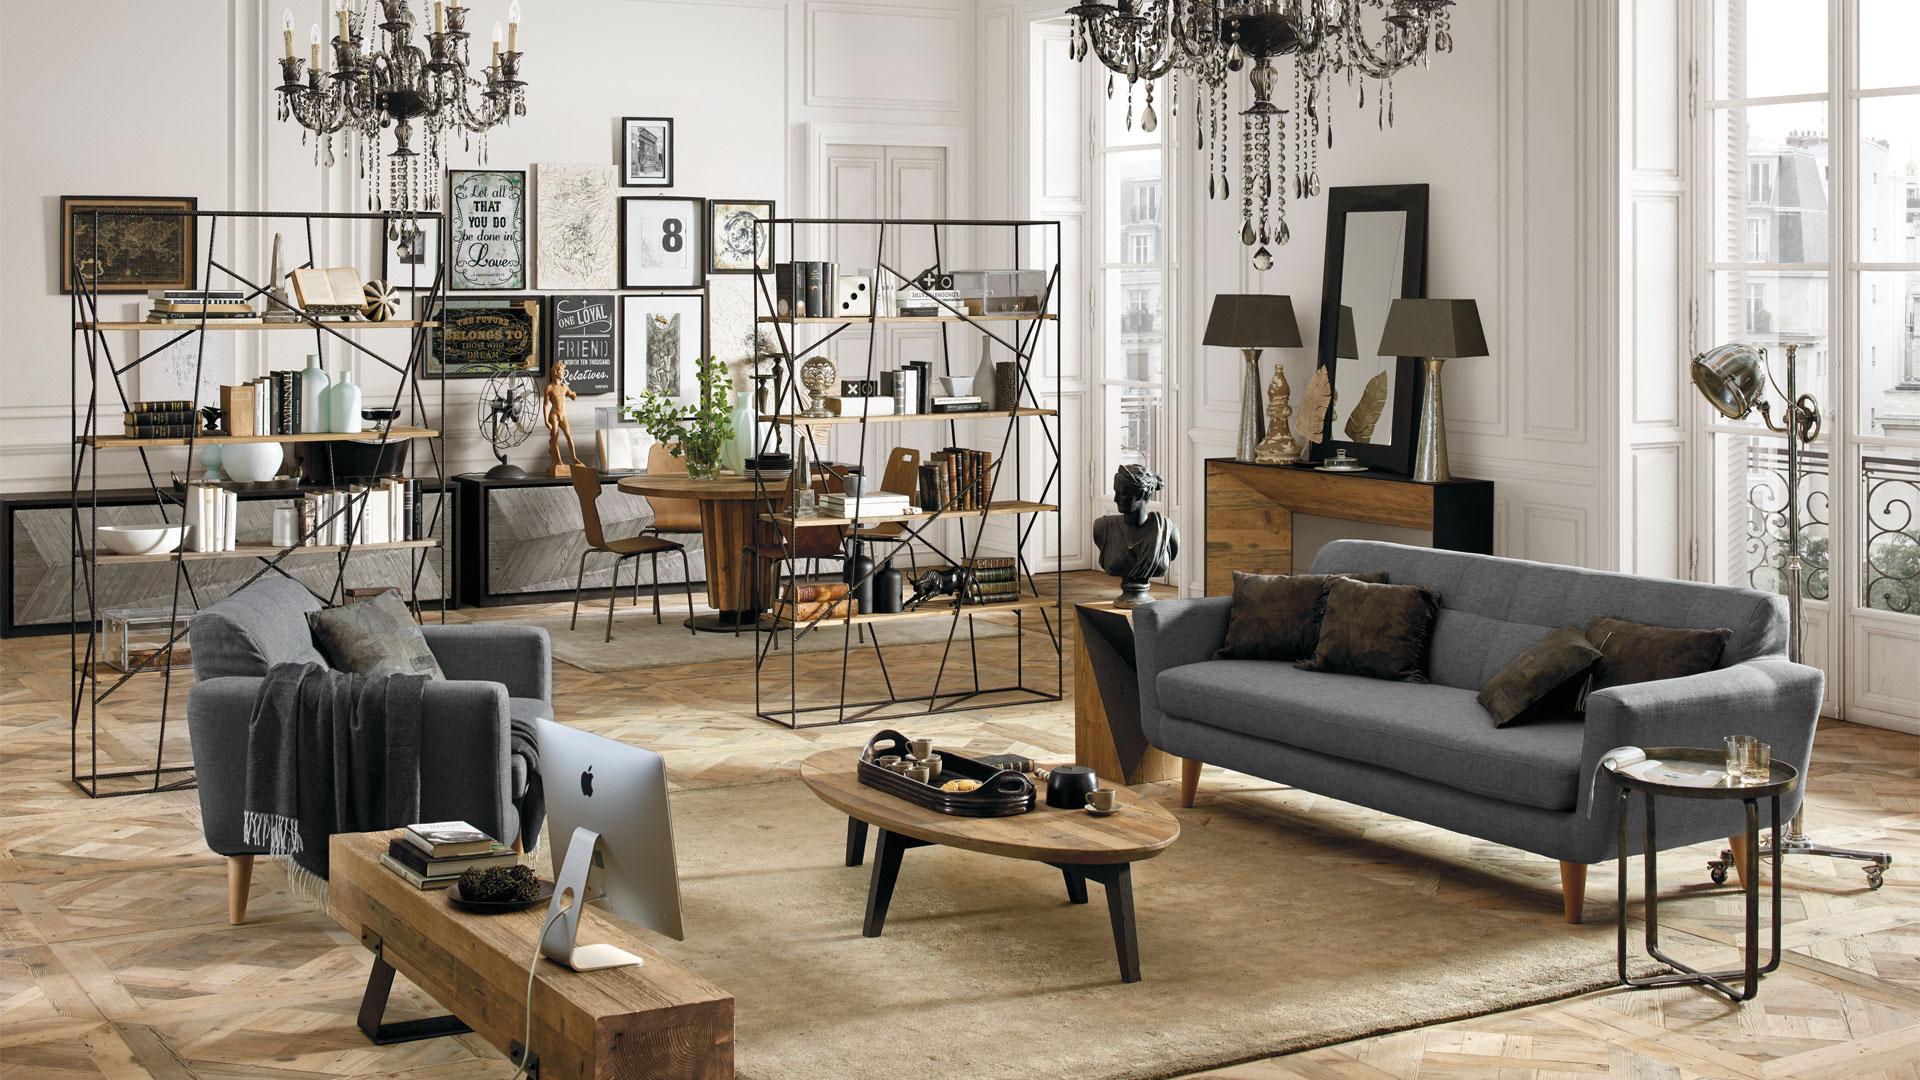 Einzigartige Industrial Style Möbel online shoppen | STUFF Shop